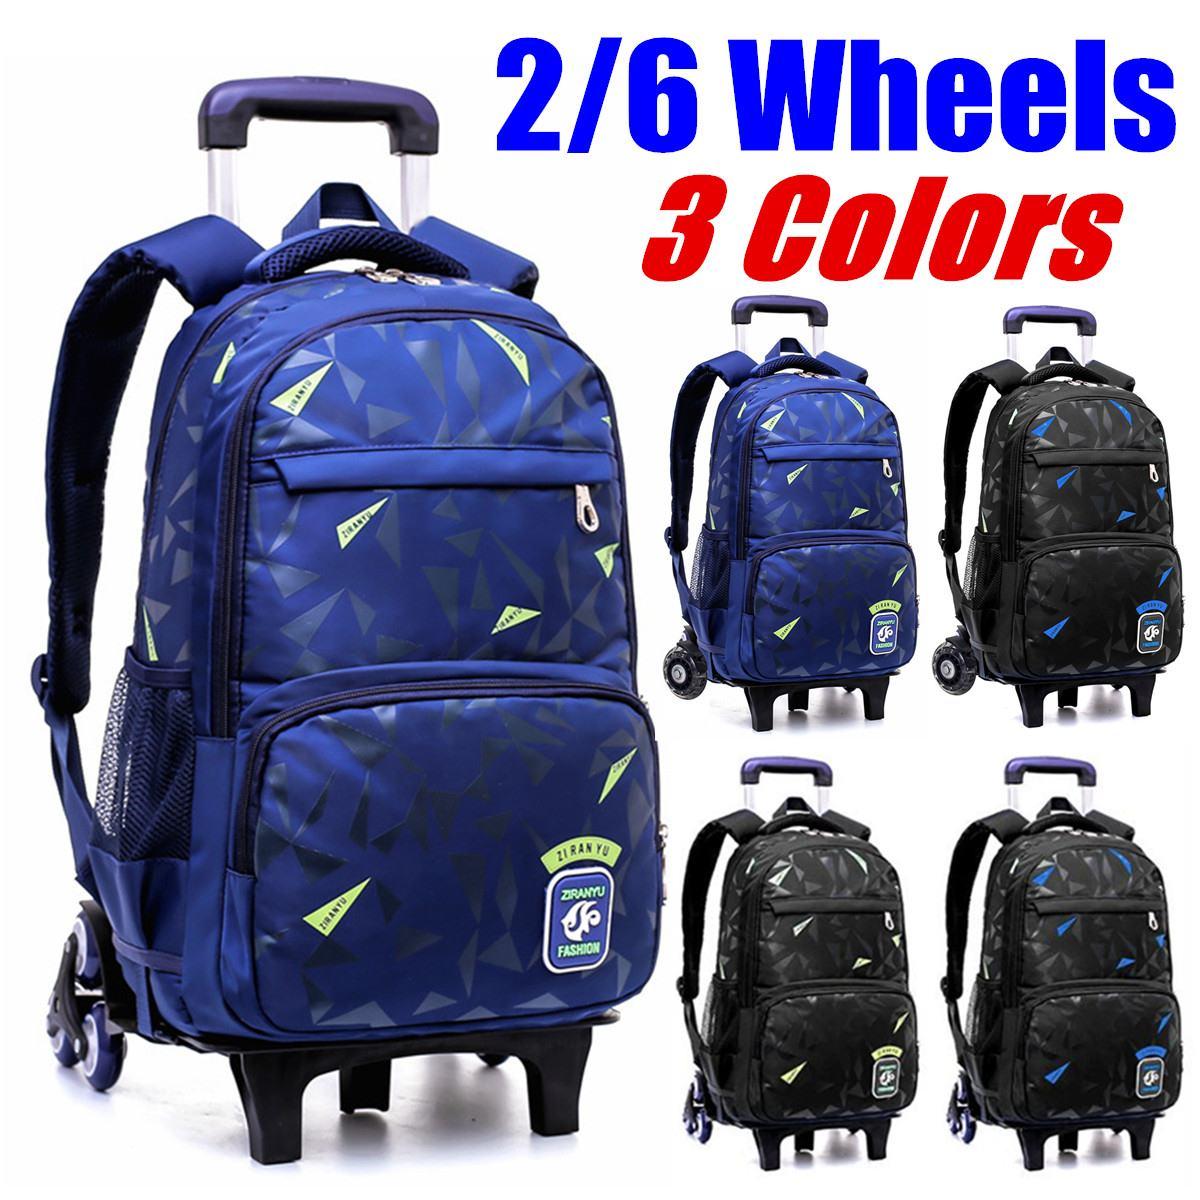 2019 NEW Waterproof Removable Children School Bags With 2/6 Wheels Stairs Kids Trolley Schoolbag Book Bags boys girls Backpack